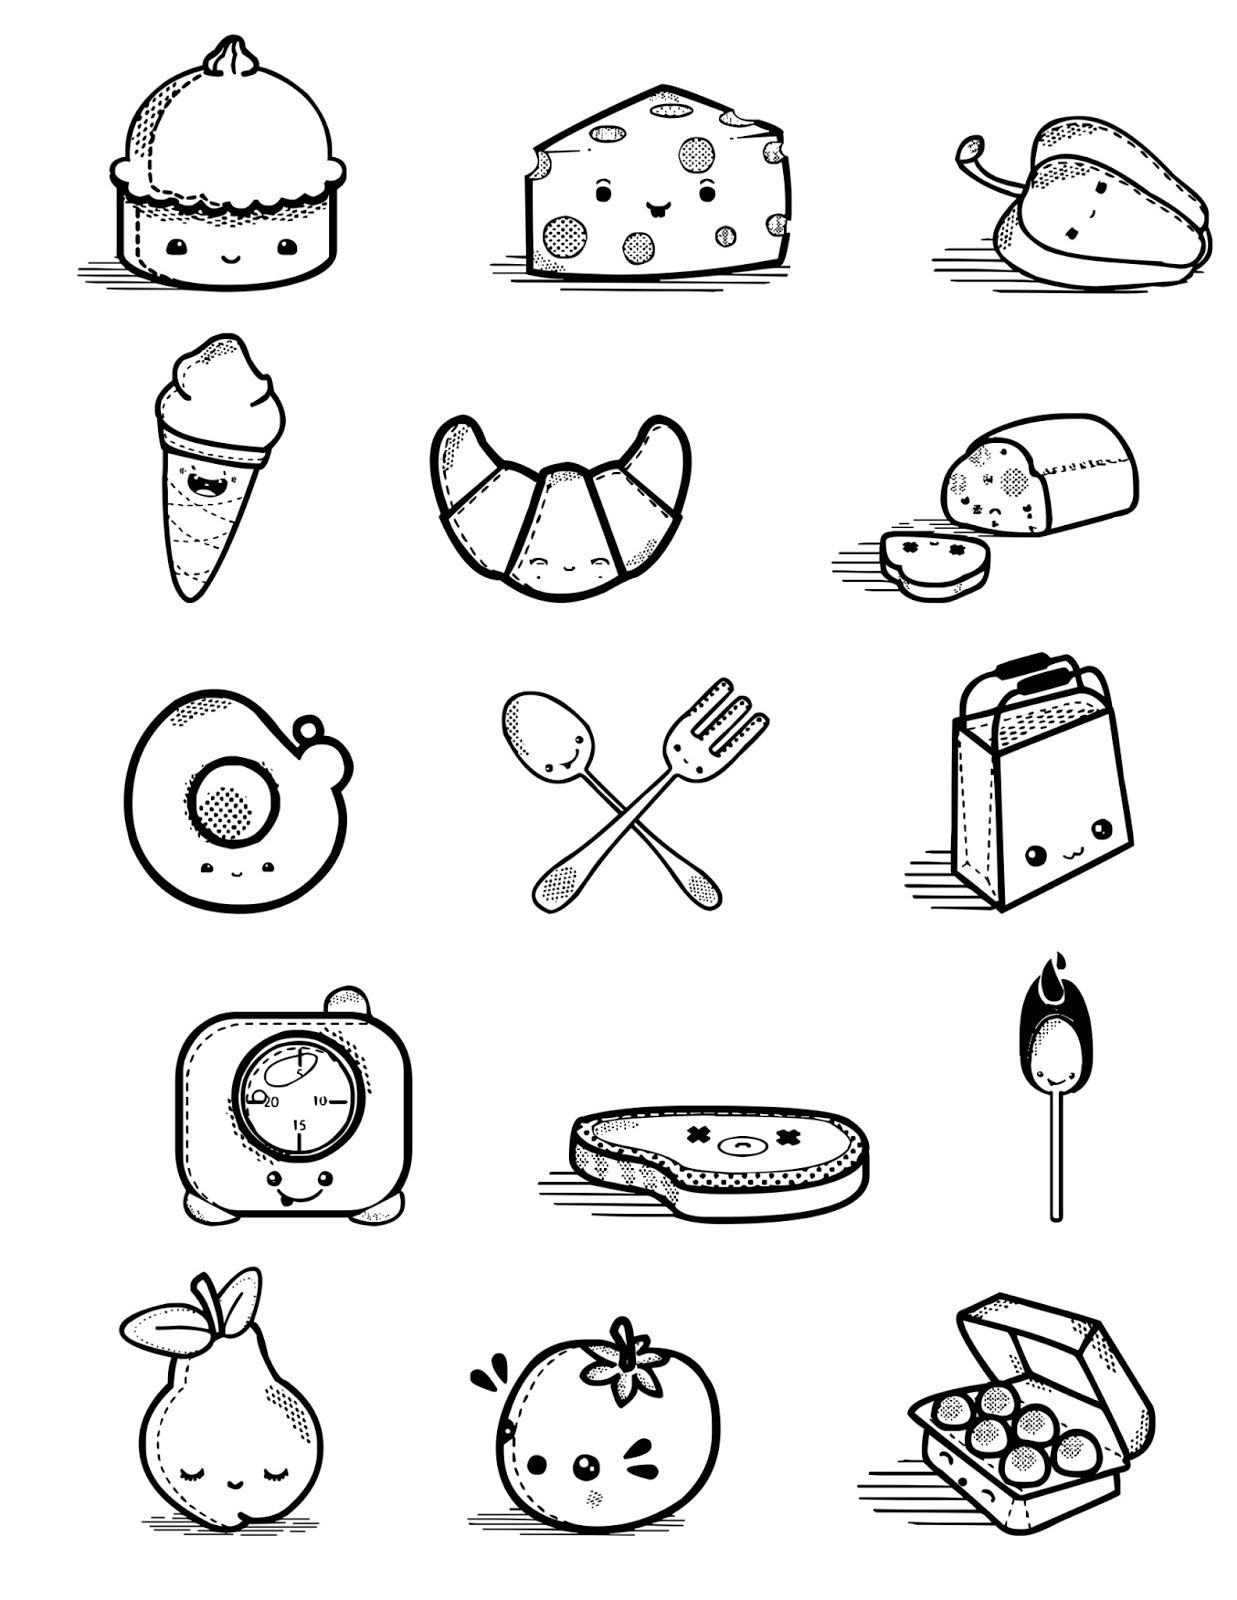 Ilustraciones Dibujos Comida Kawaii Desenhos Fofos